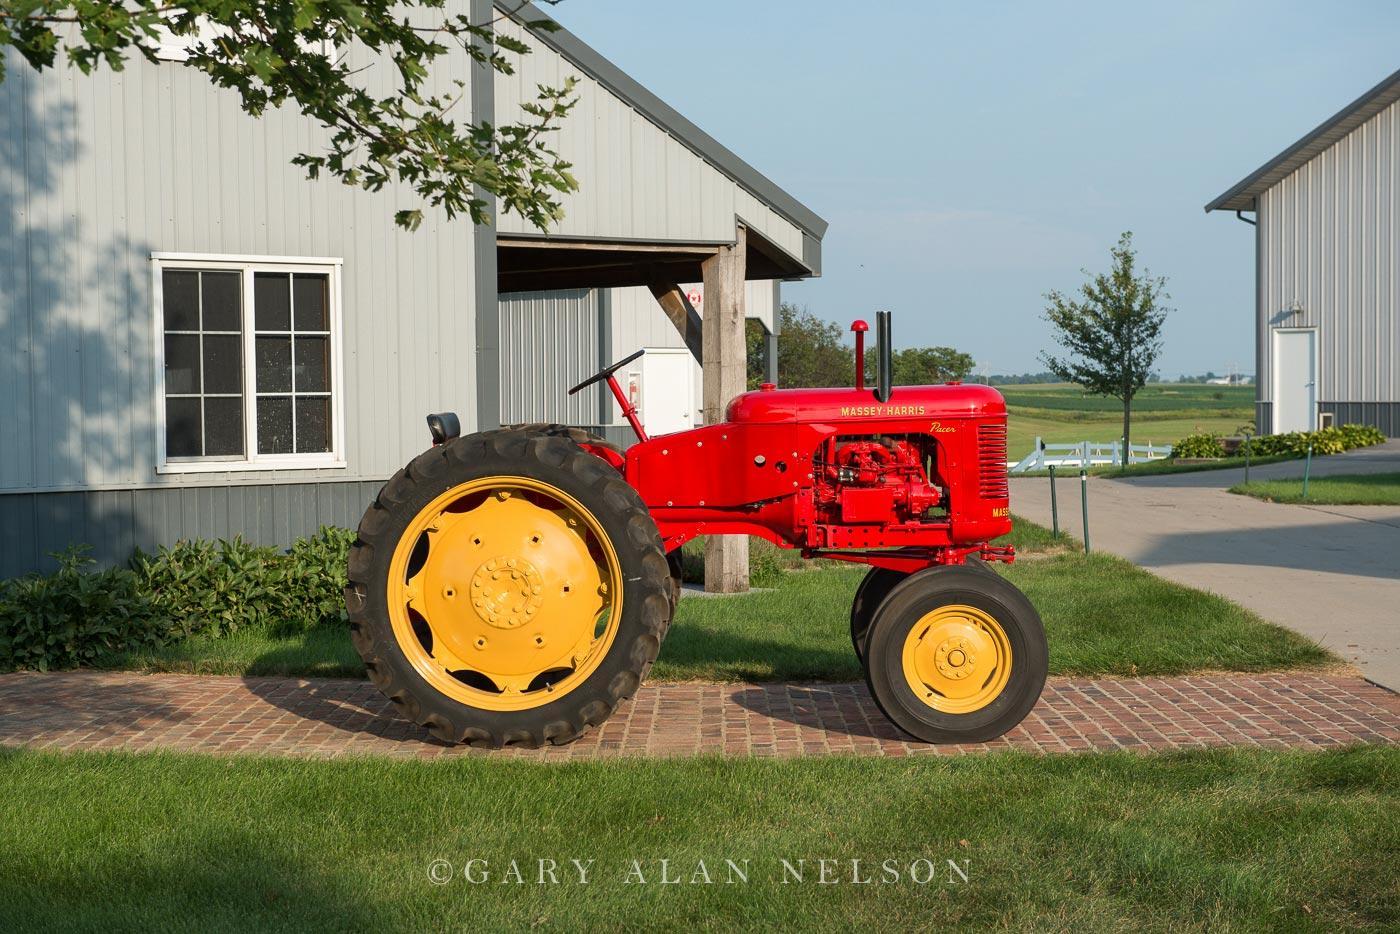 antique tractor, Massey-Harris, photo